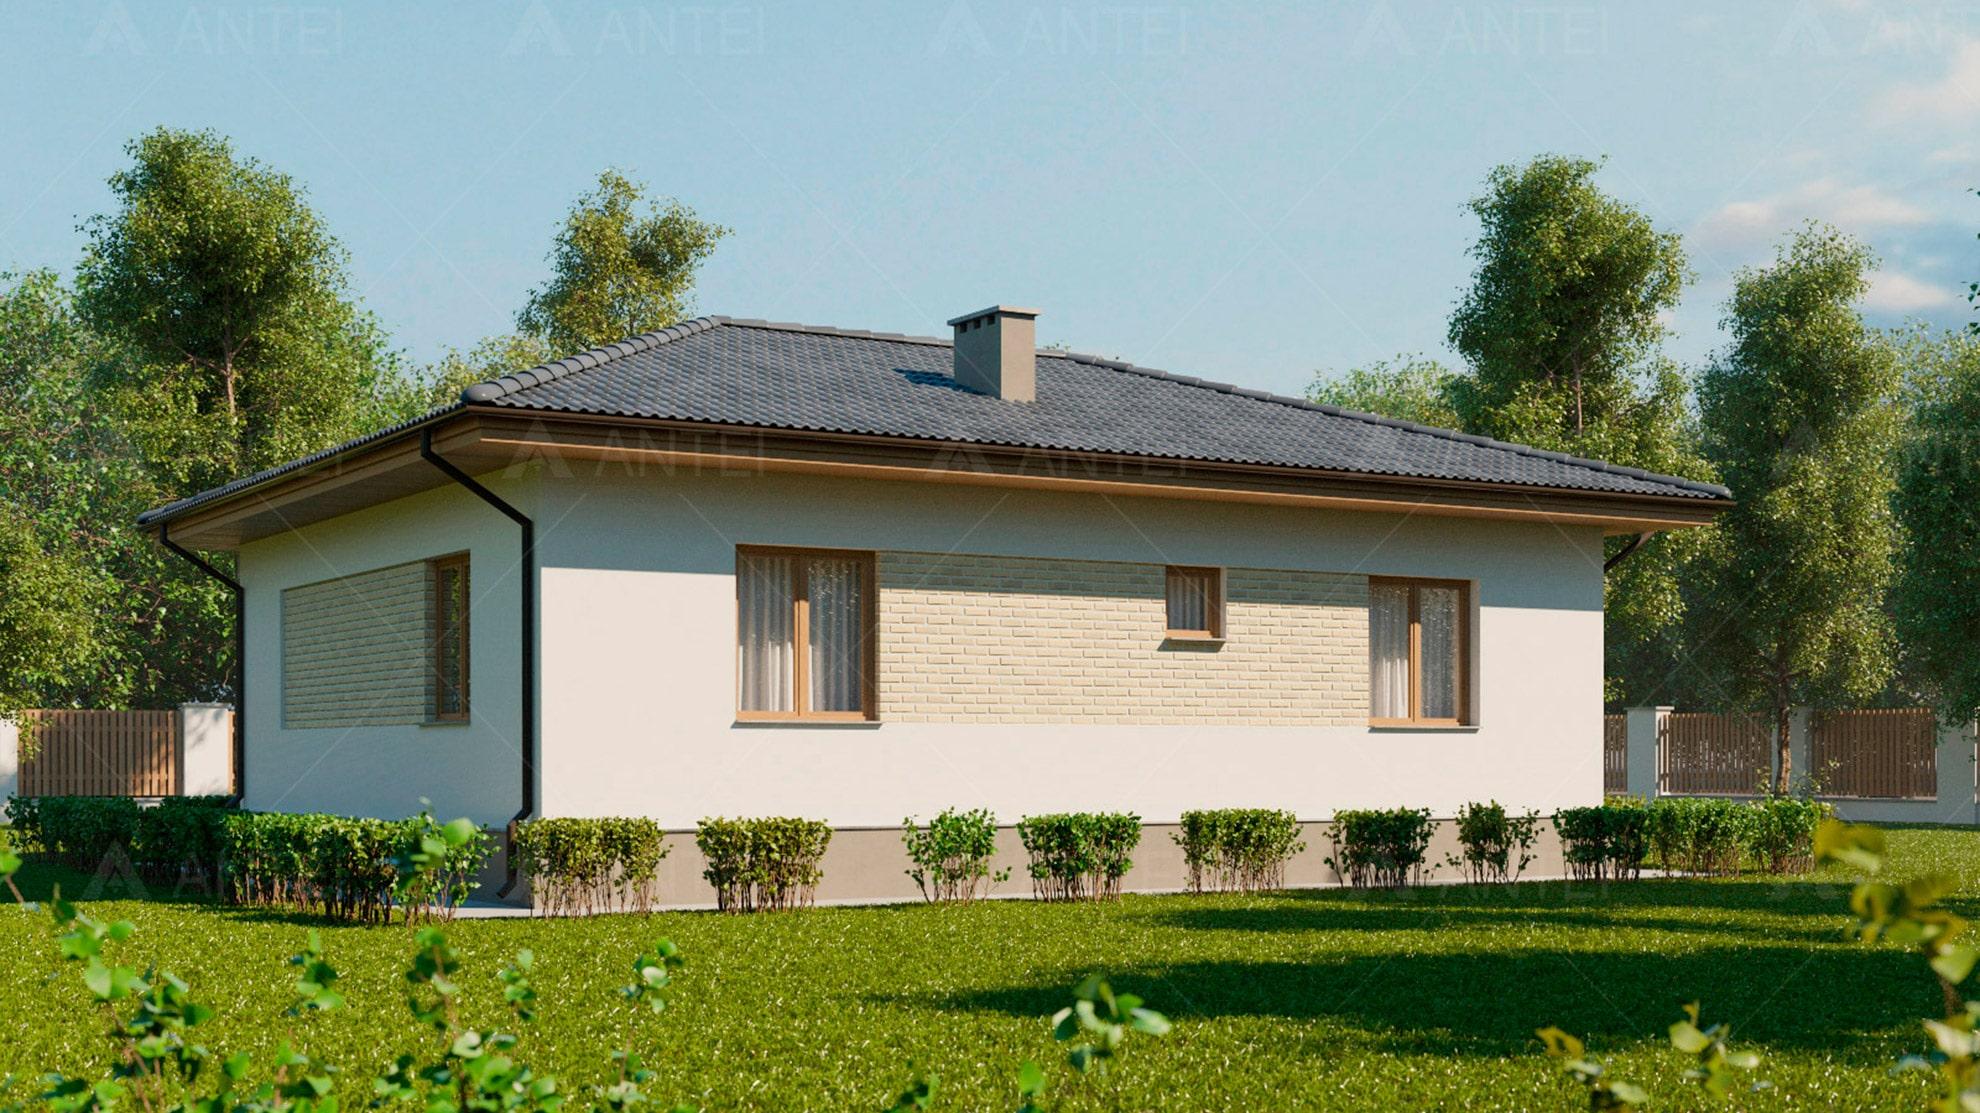 Проект одноэтажного дома «КО-3» - фото №2